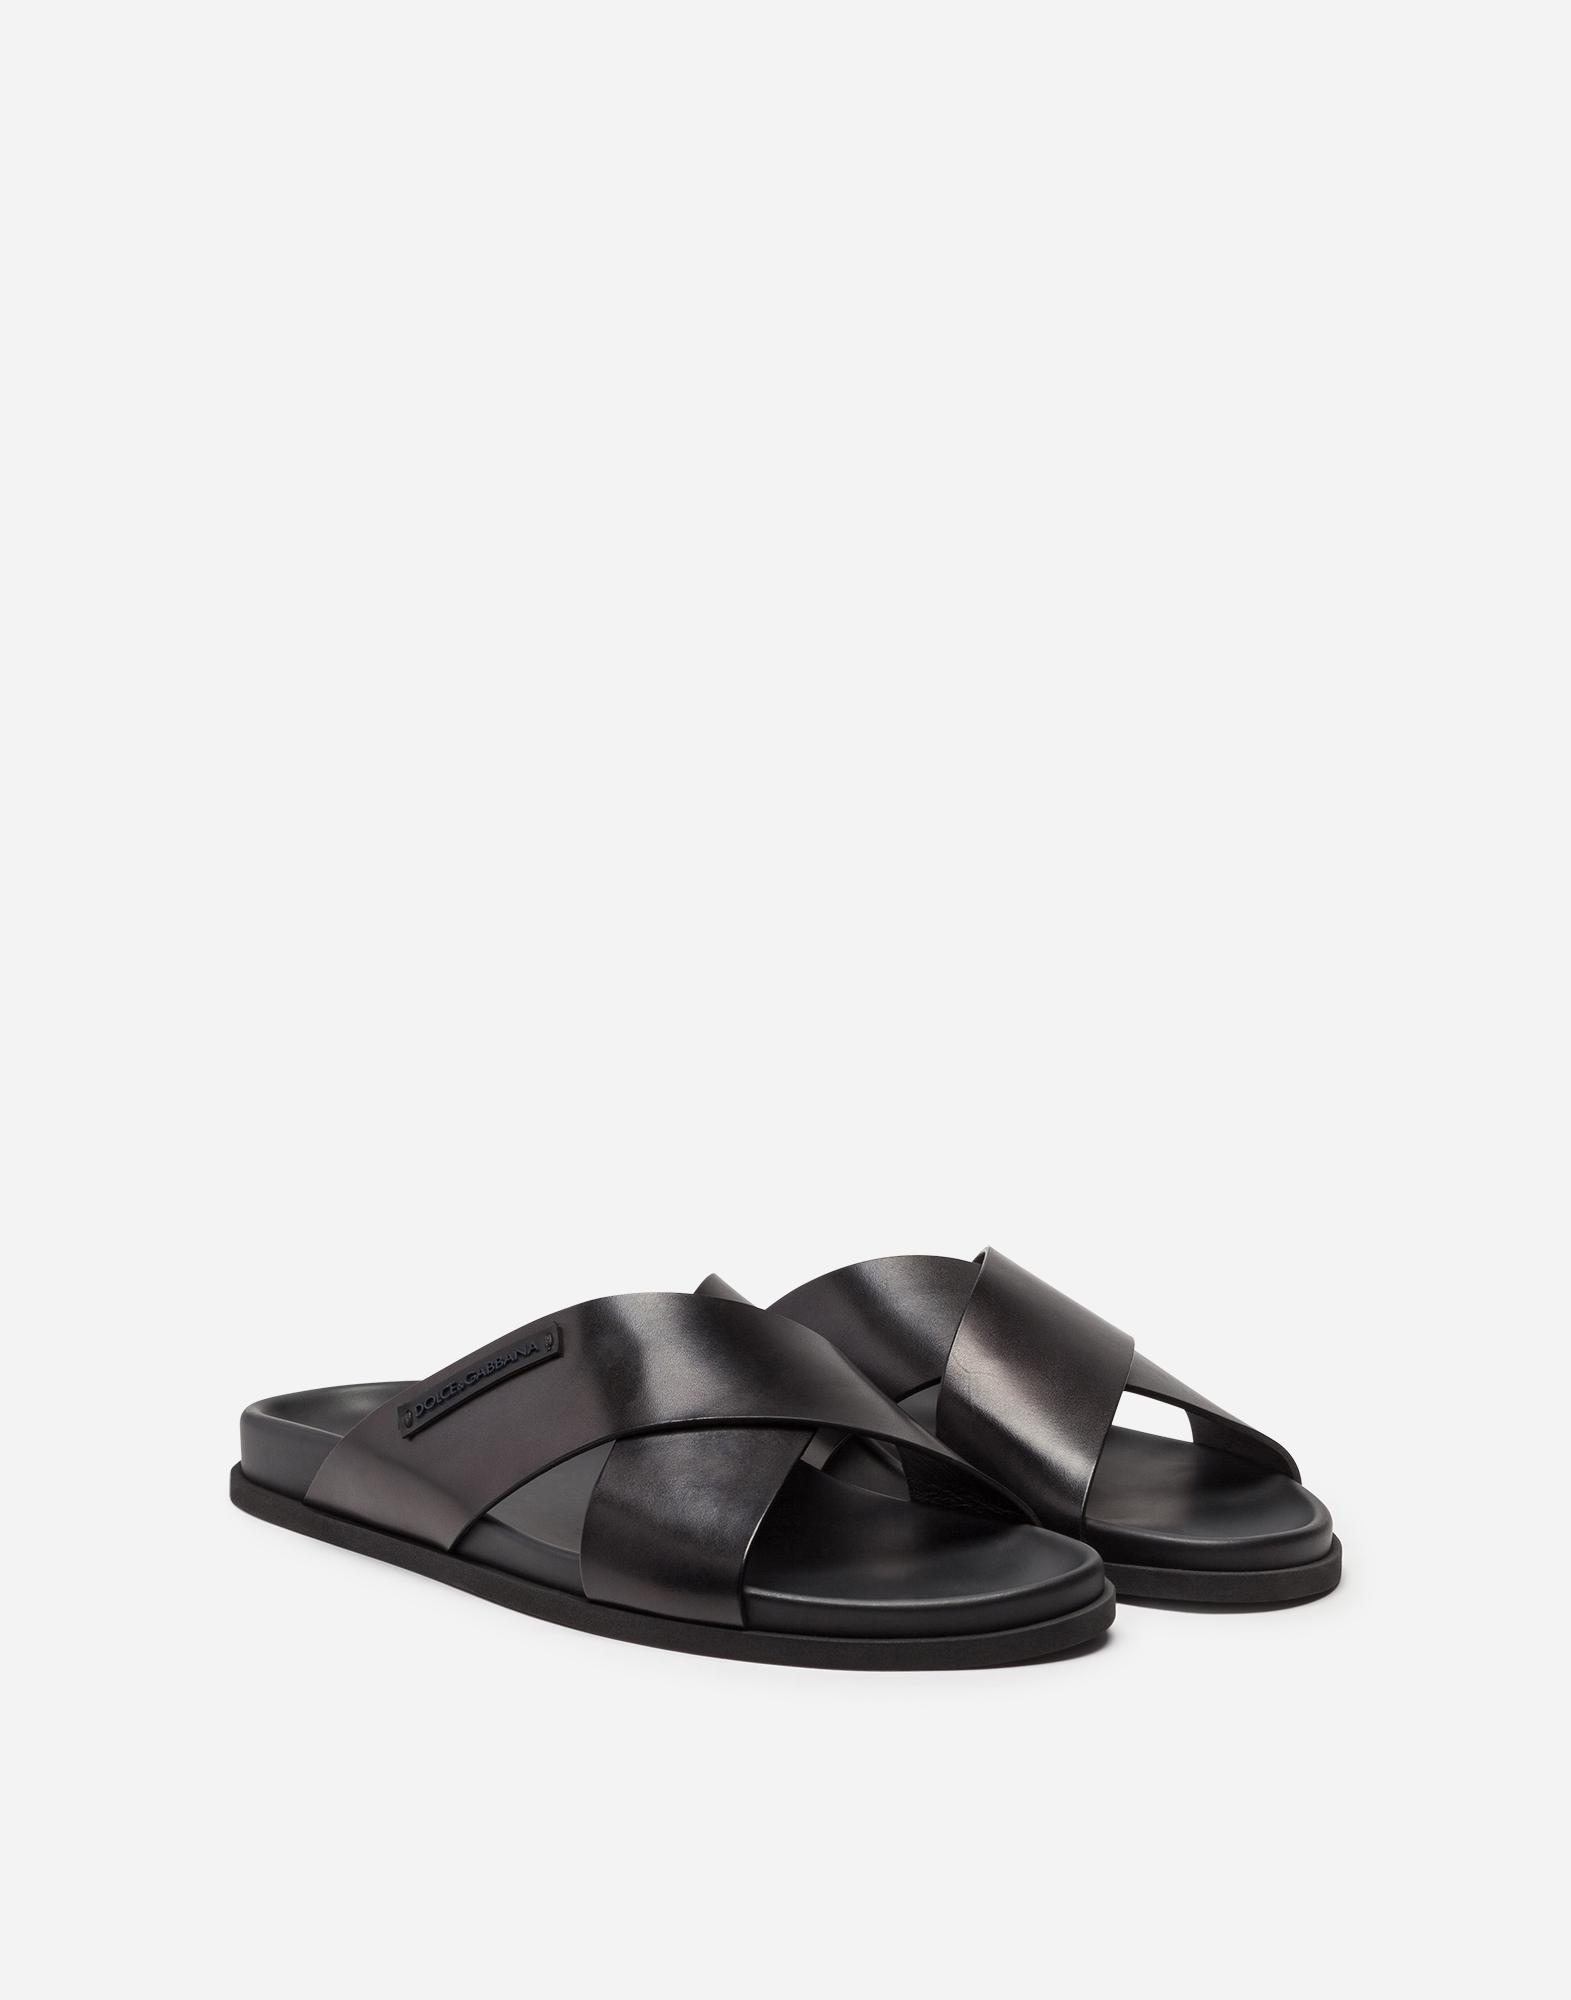 b566603b1ab2 Calfskin Sandals - Men s Shoes